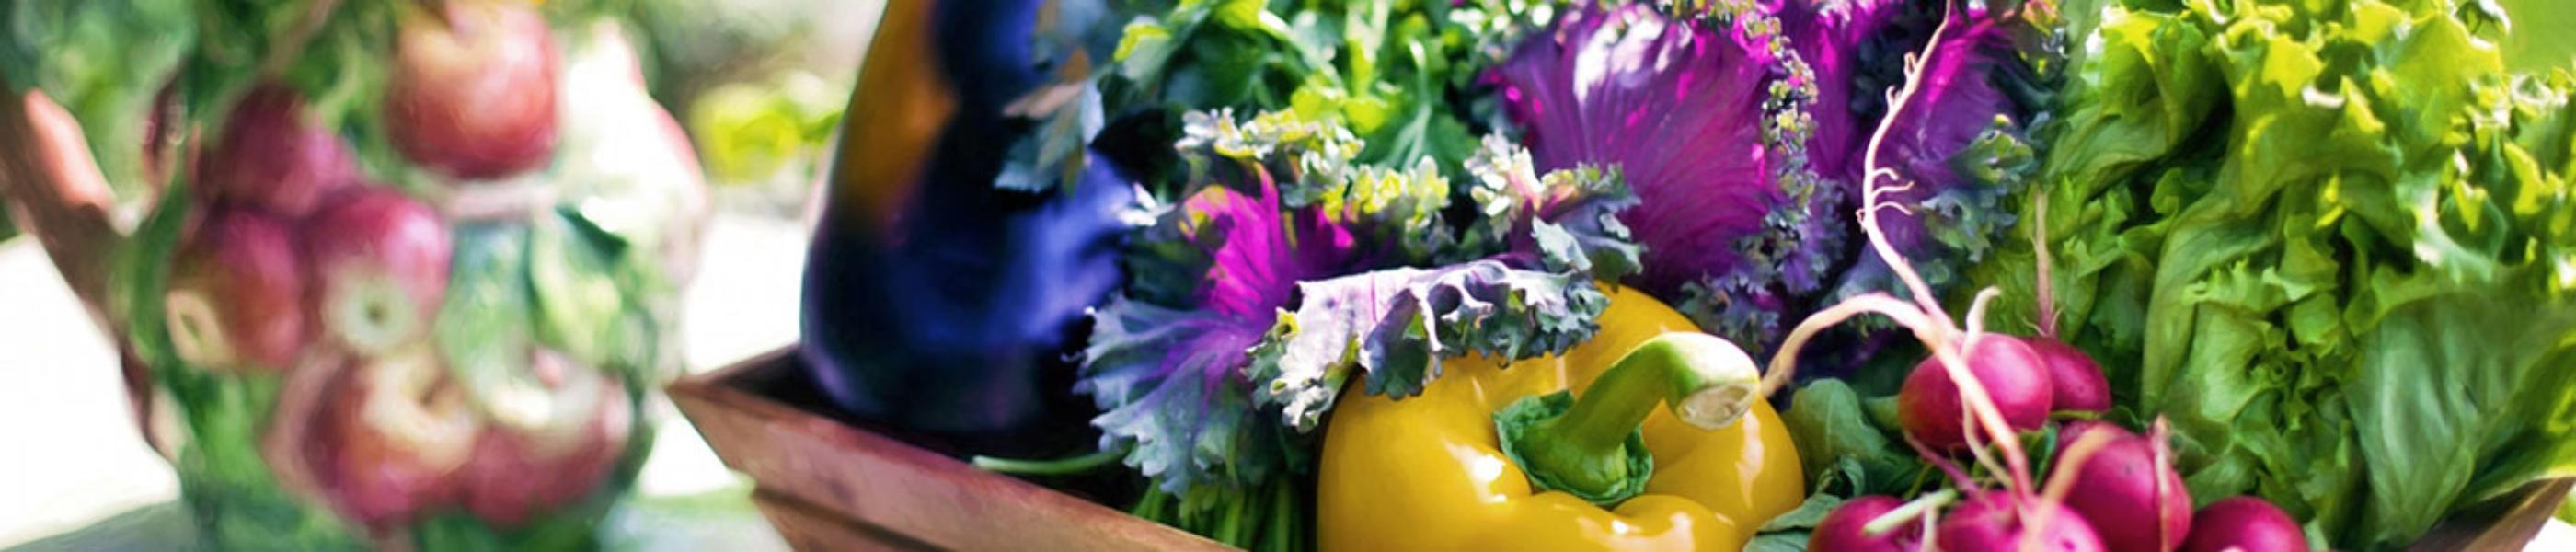 organic-vegetables-2-2800x600_update